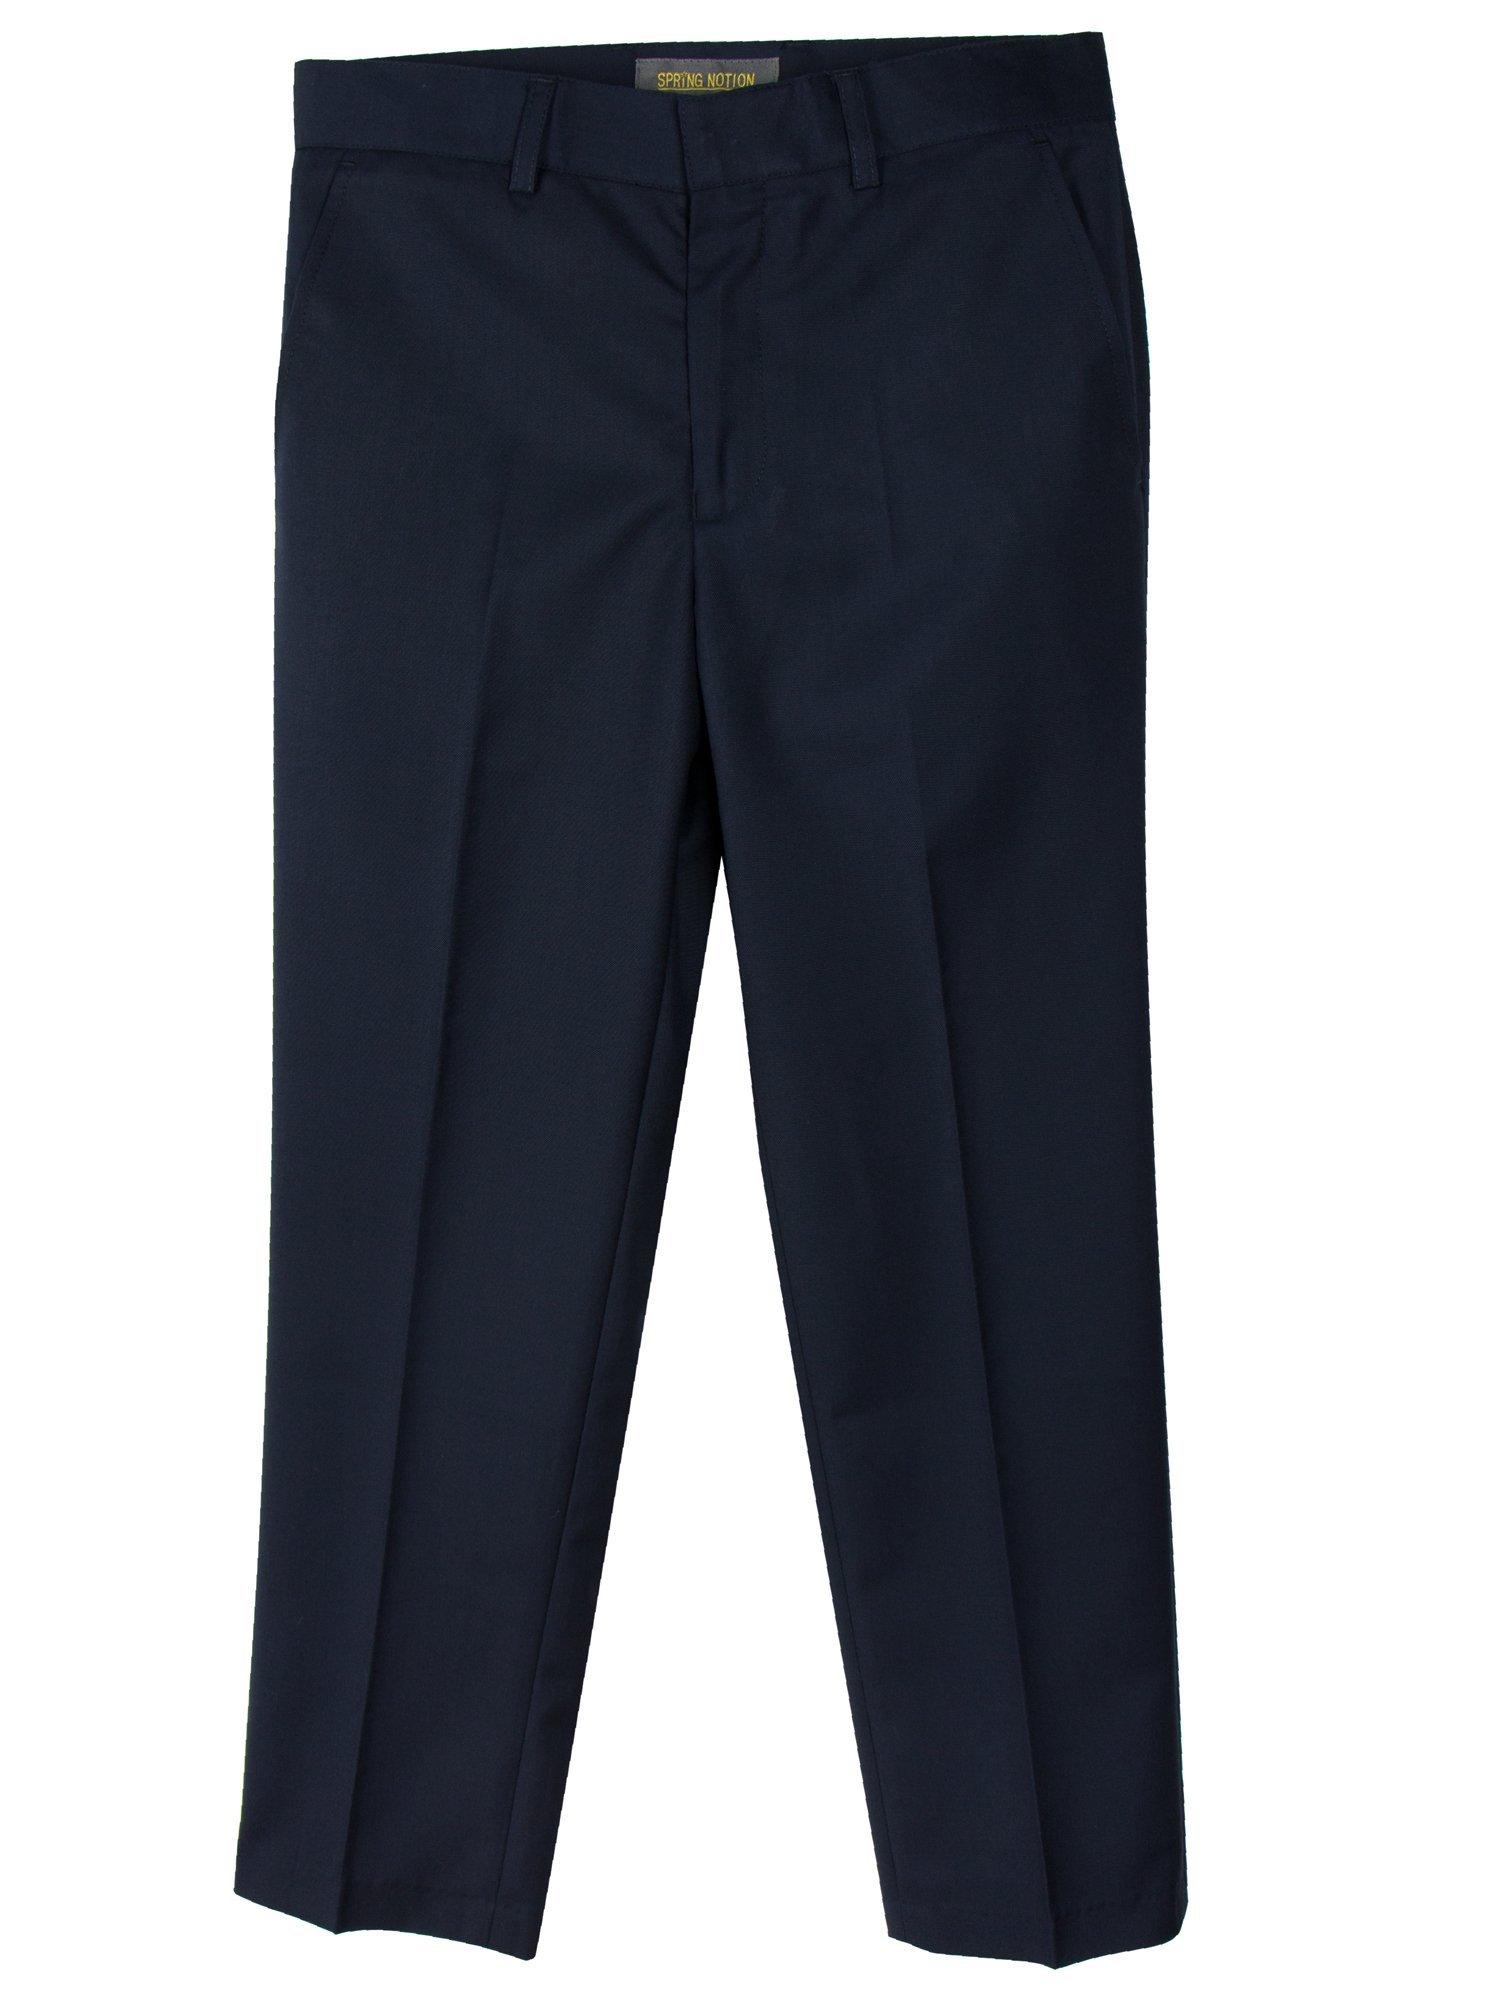 Spring Notion Boys' Flat Front Dress Pants 2T Navy